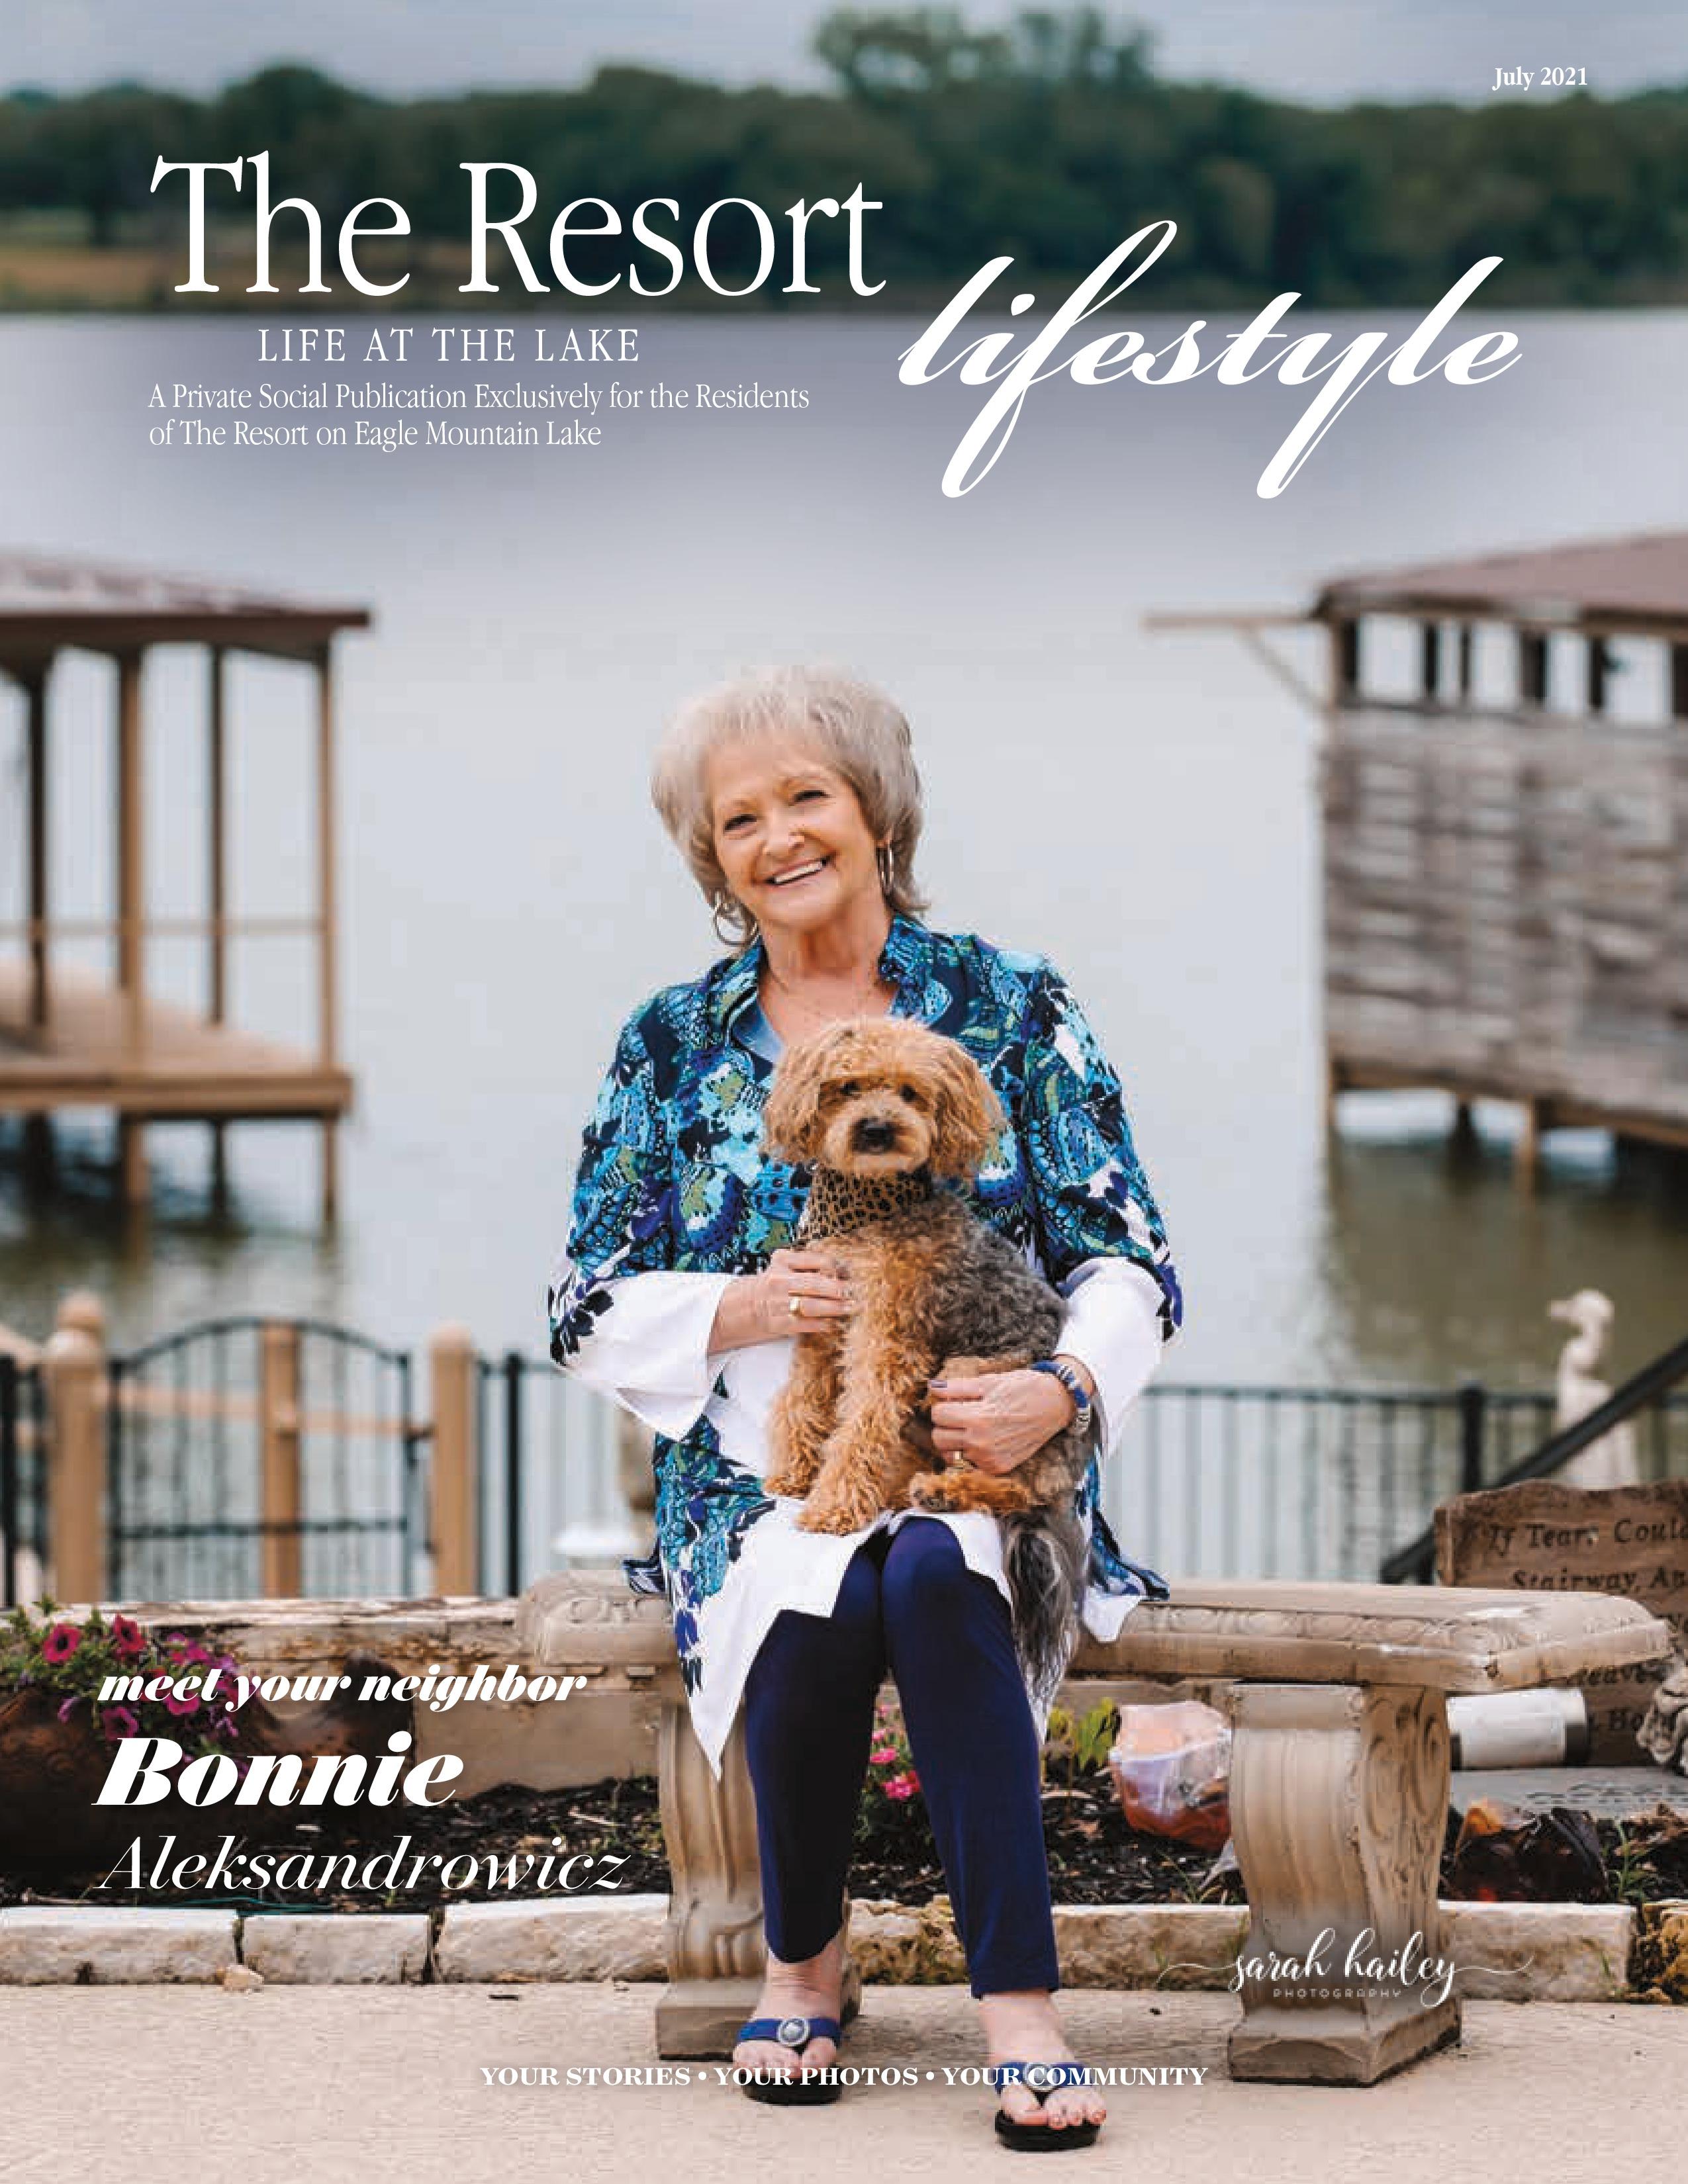 The Resort Lifestyle 2021-07-01